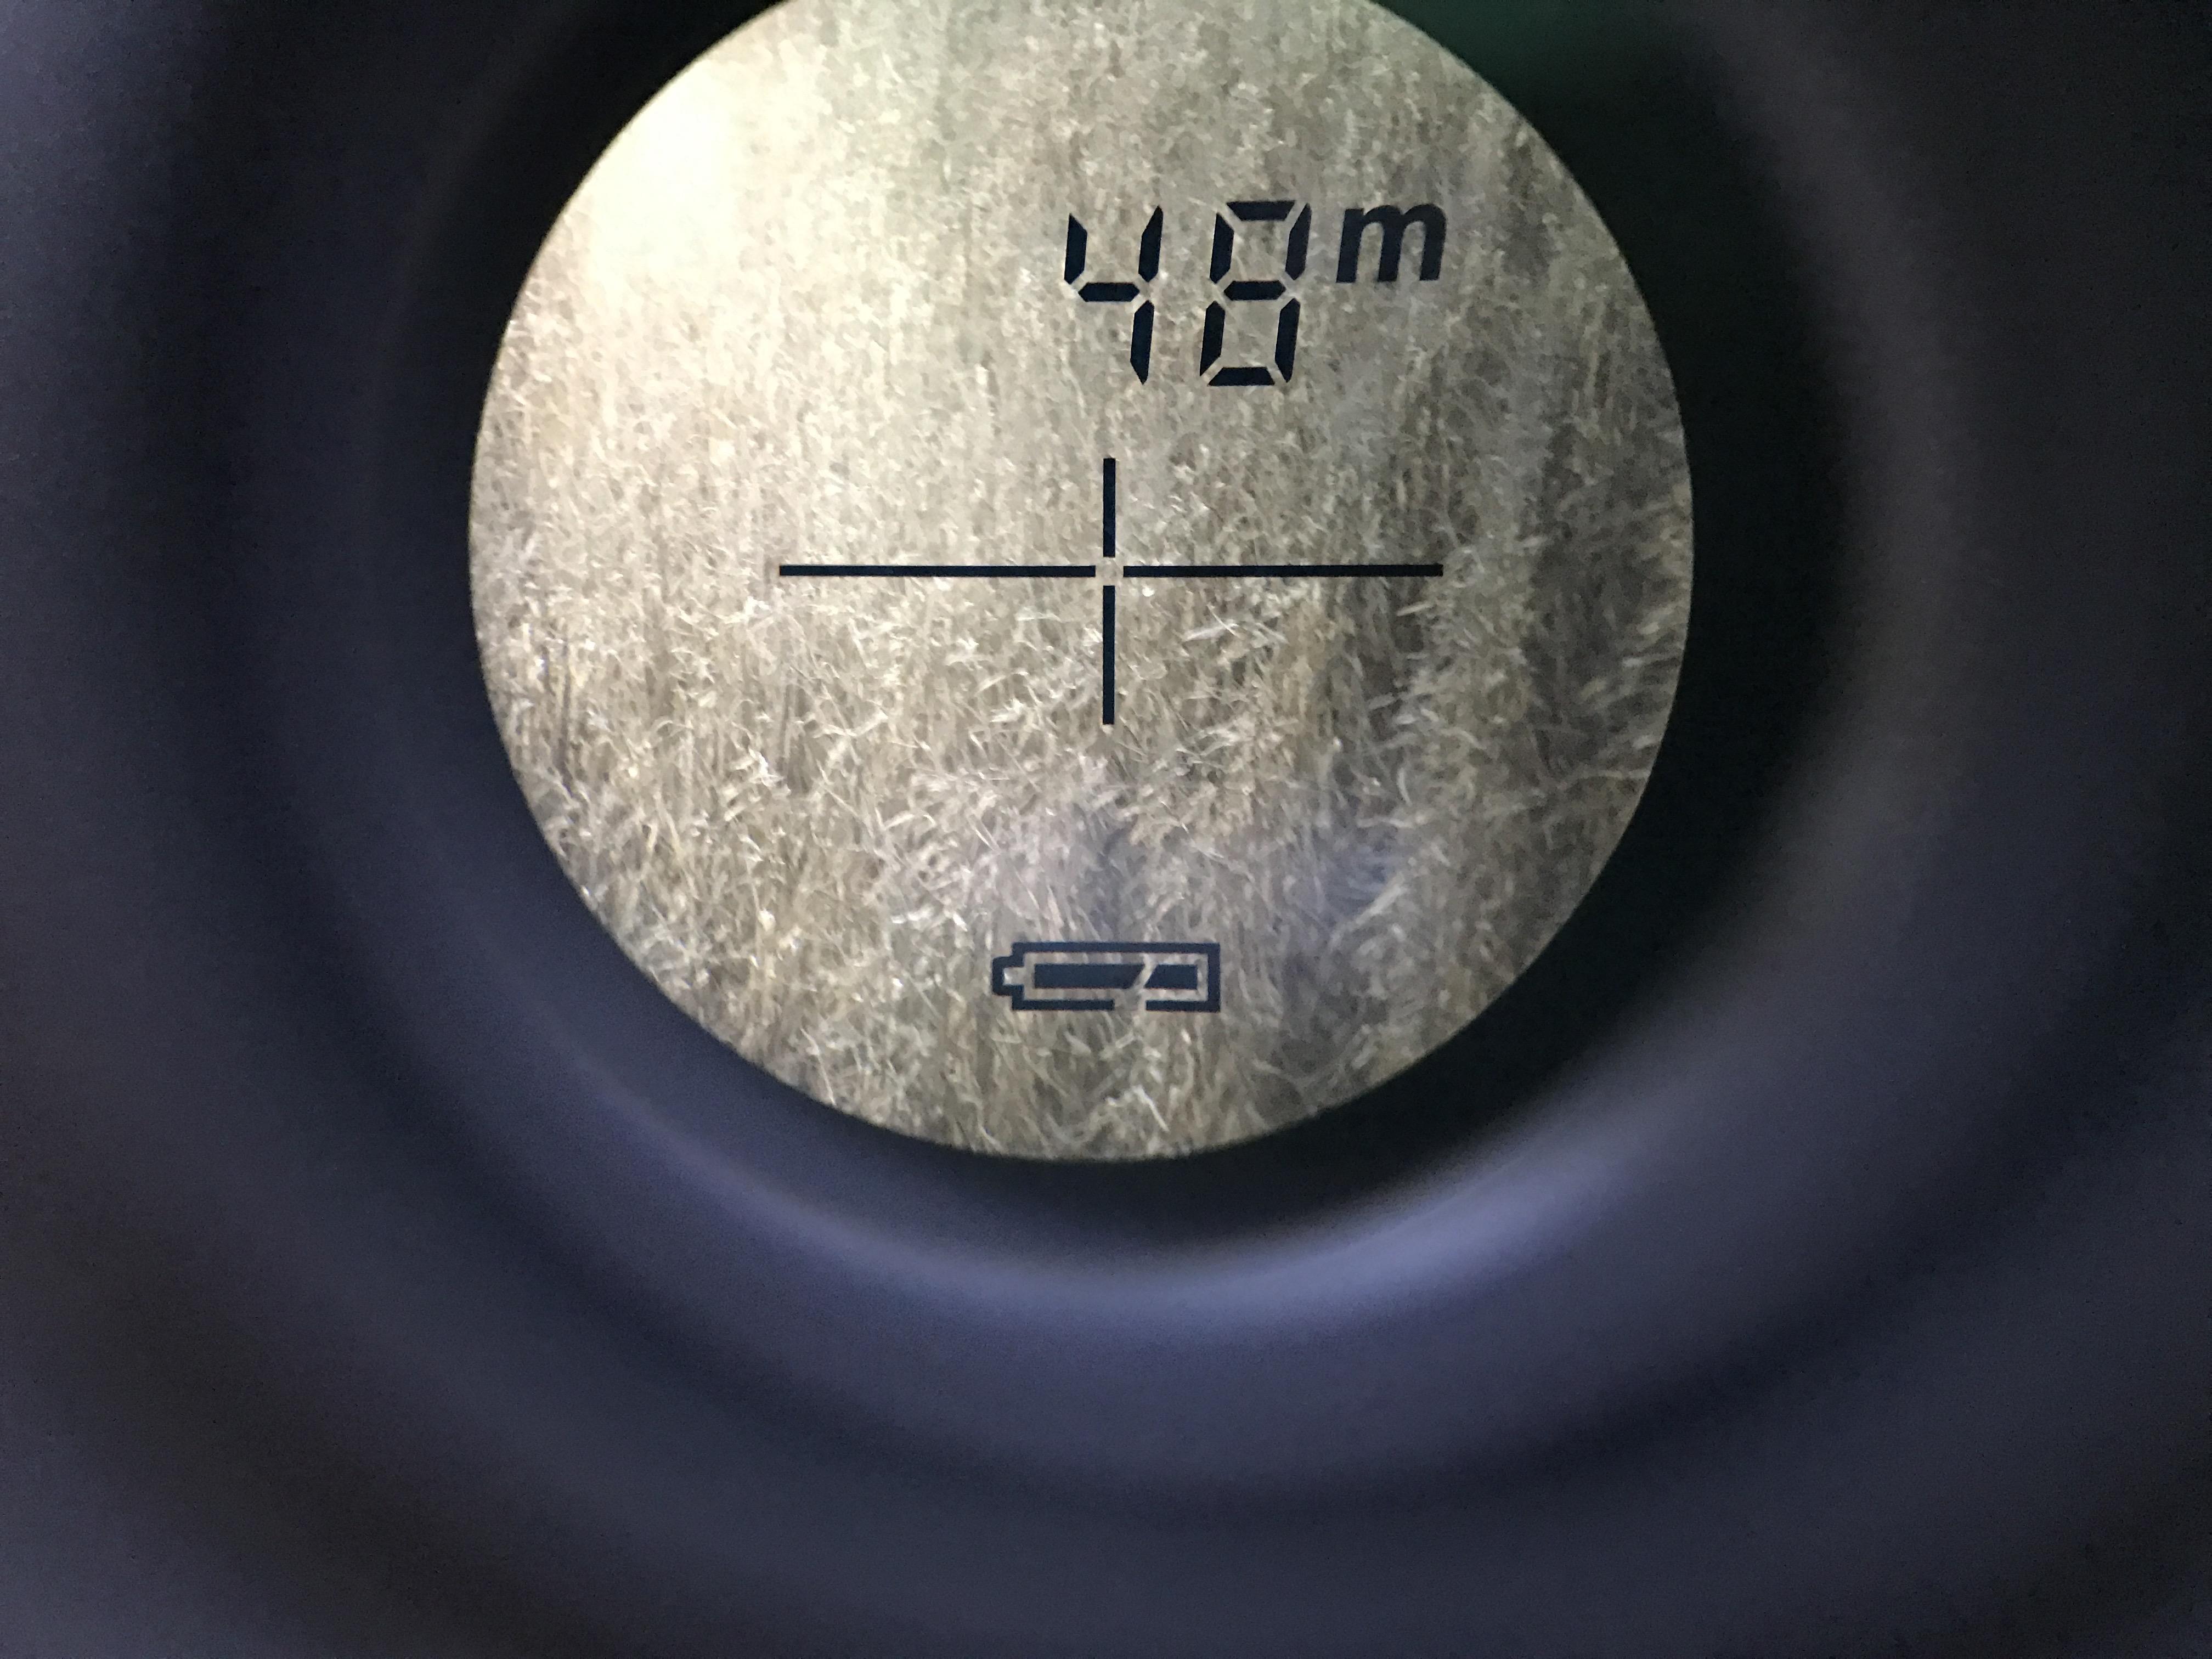 Entfernungsmesser Jagd Nikon Aculon : Test nikon aculon al entfernungsmesser u jagd und natur